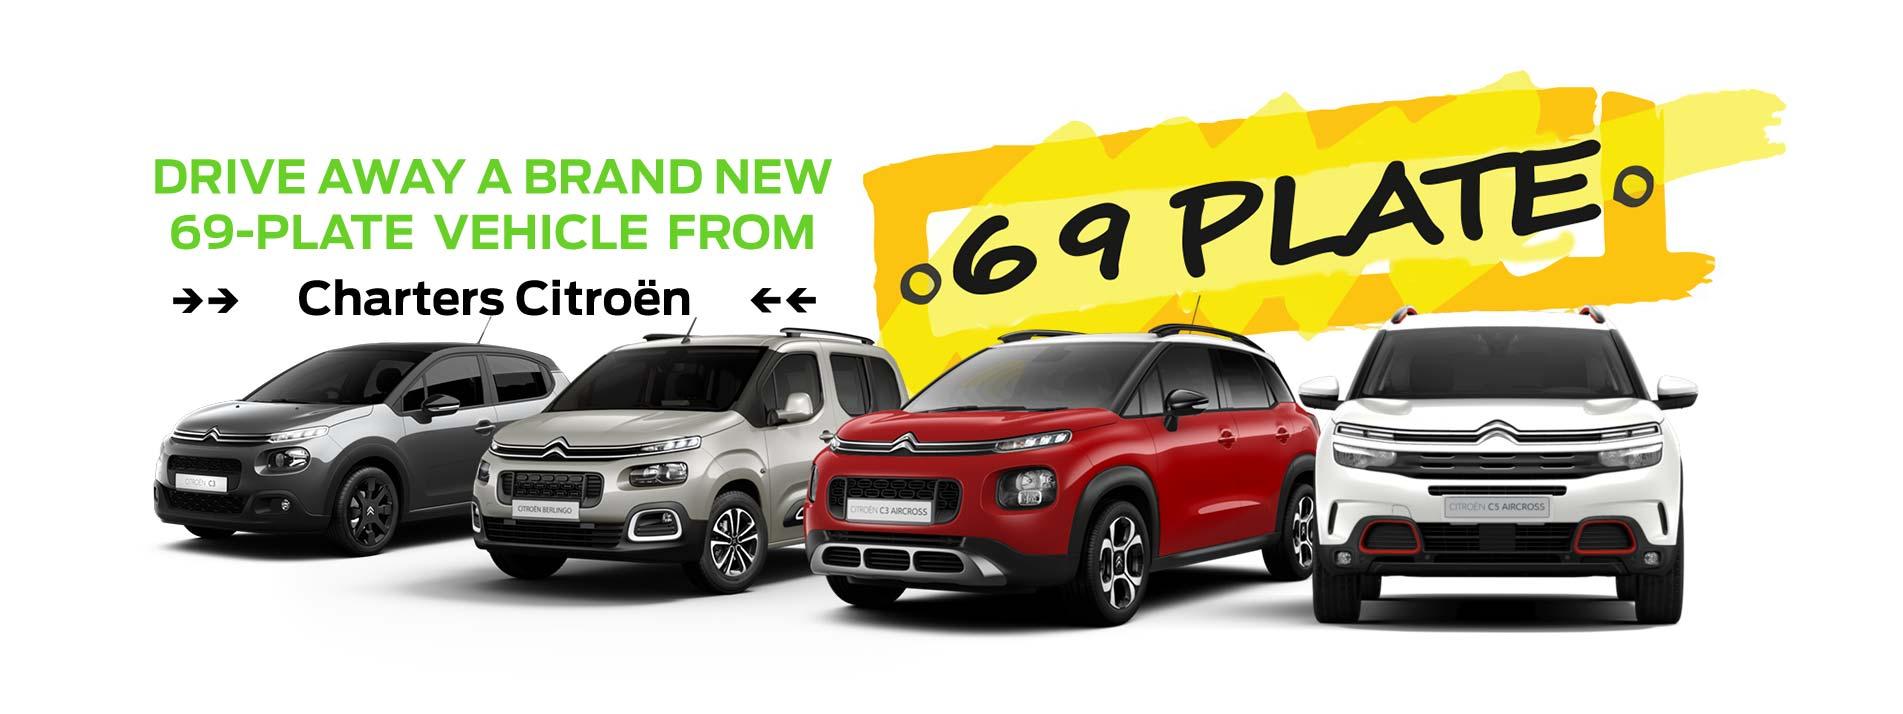 69-plate-citroen-cars-vans-for-sale-aldershot-m-sli